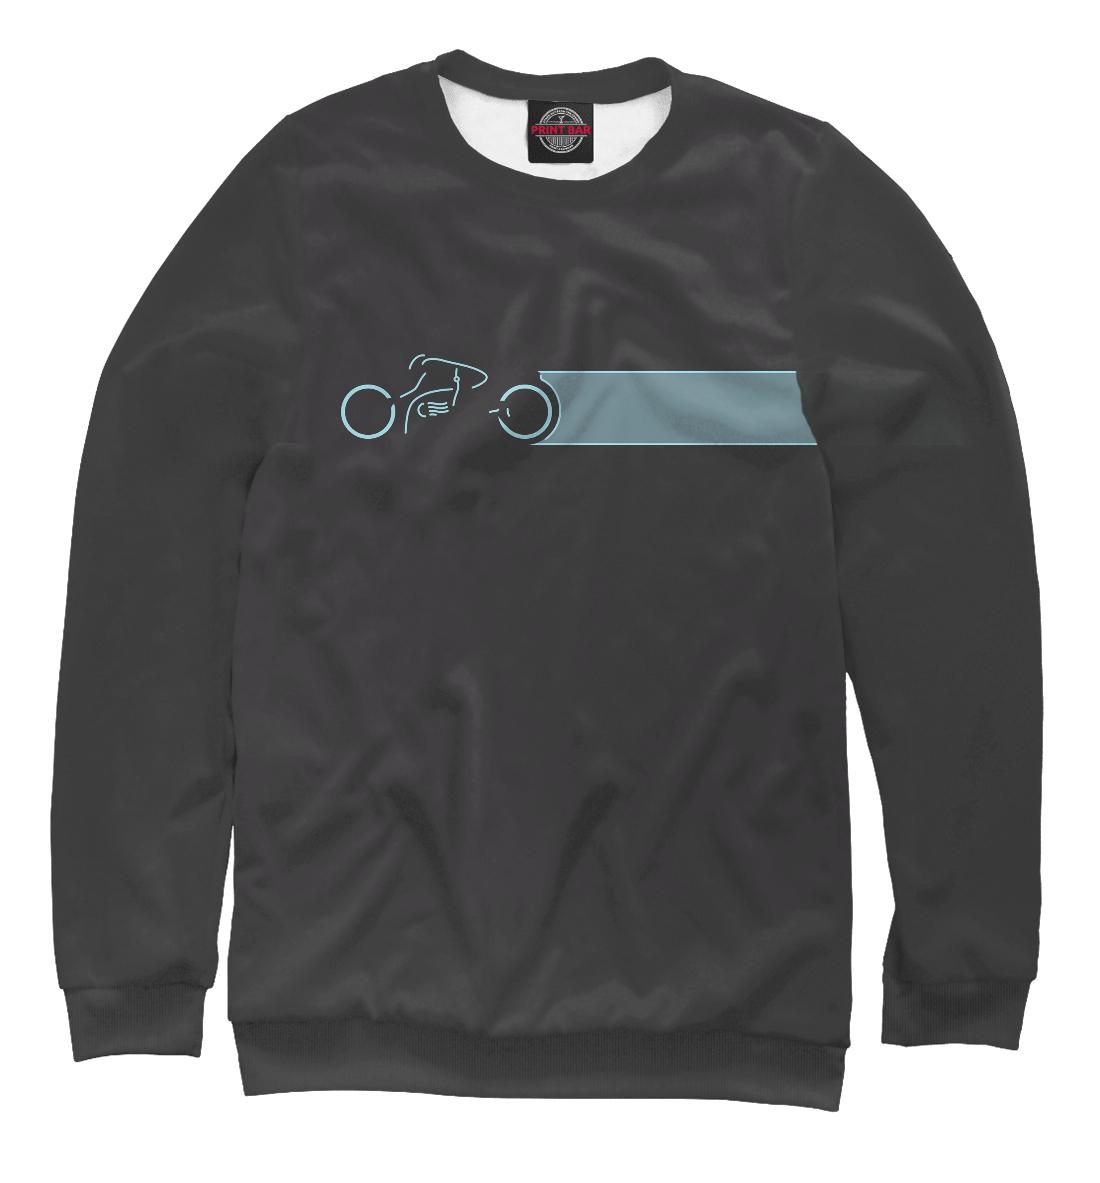 Купить Electro Bike, Printbar, Свитшоты, MTR-214297-swi-1